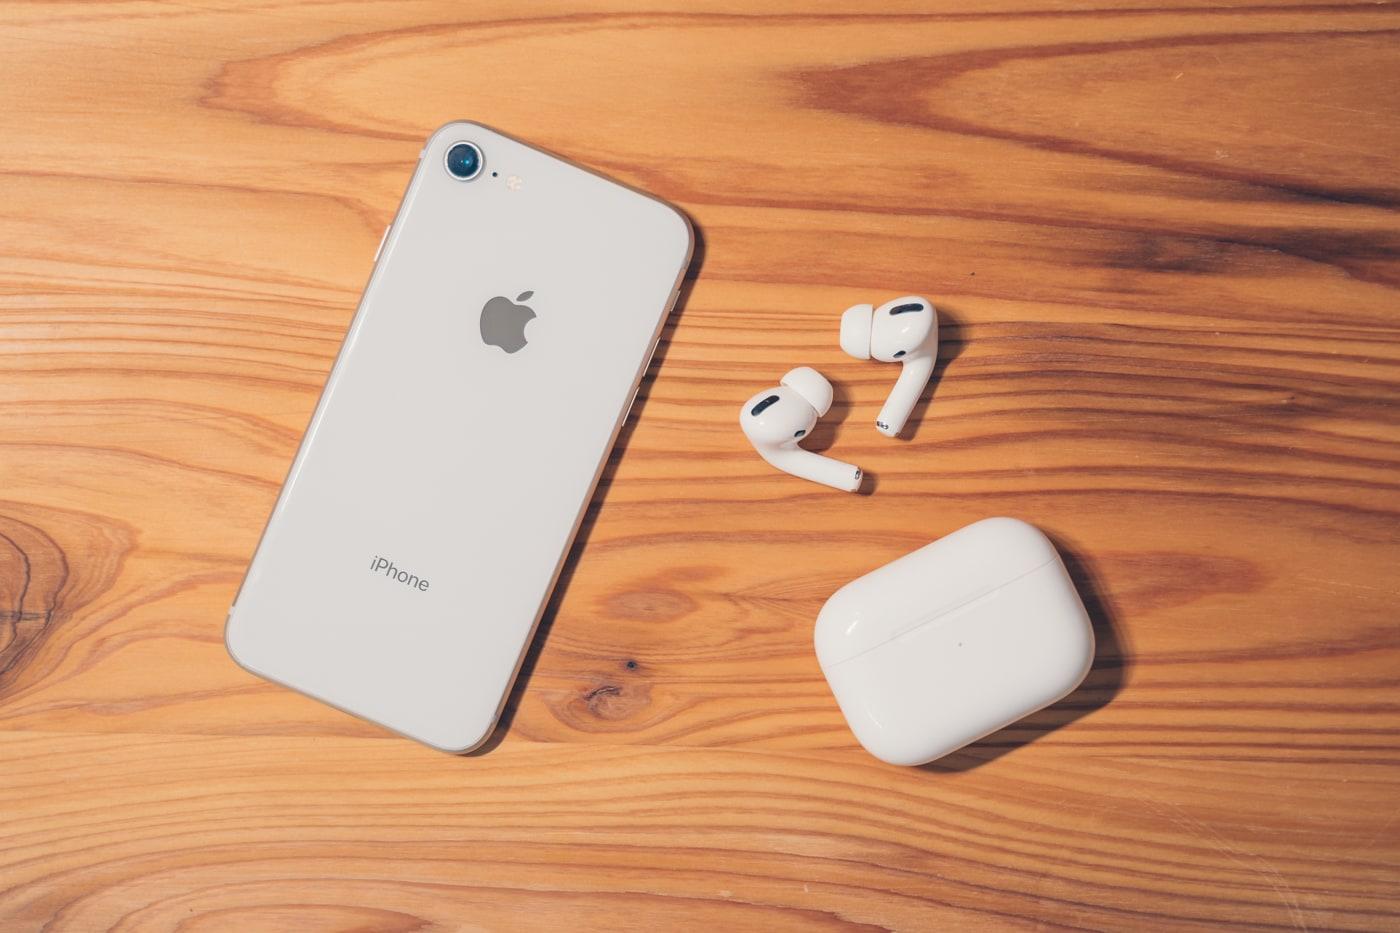 AirPodsPro(完全ワイヤレスイヤホン)とiPhone12 mini